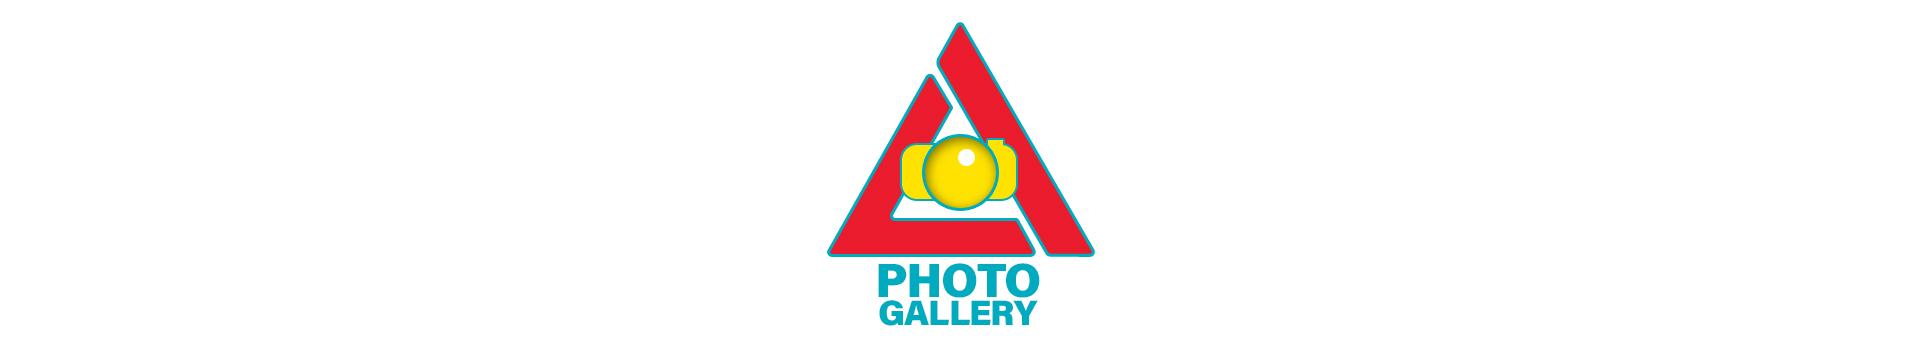 ActiveKidz Photo Gallery